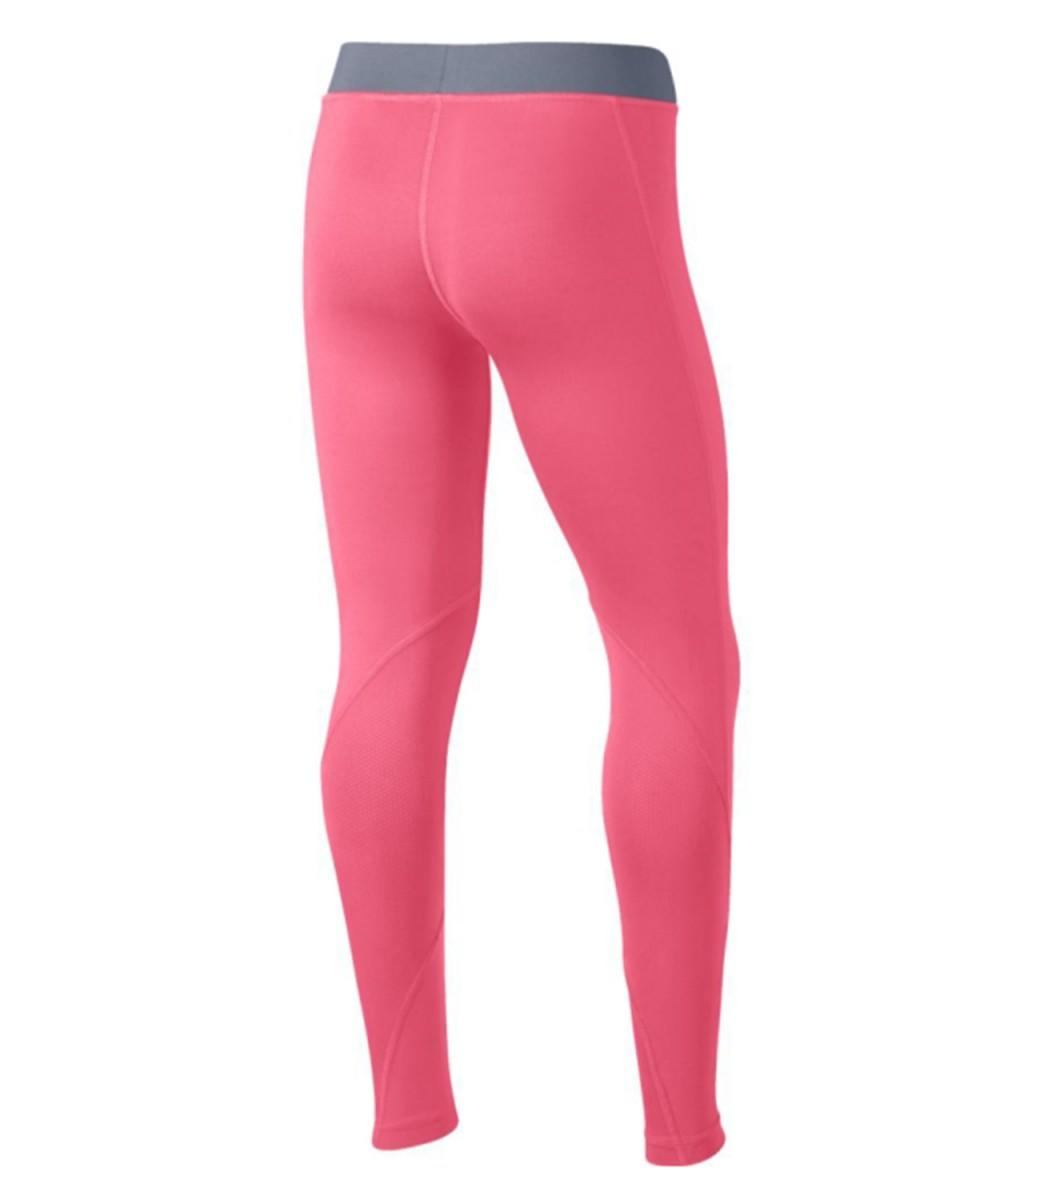 Леггинсы детские Nike Pro Long Tights pink/grey